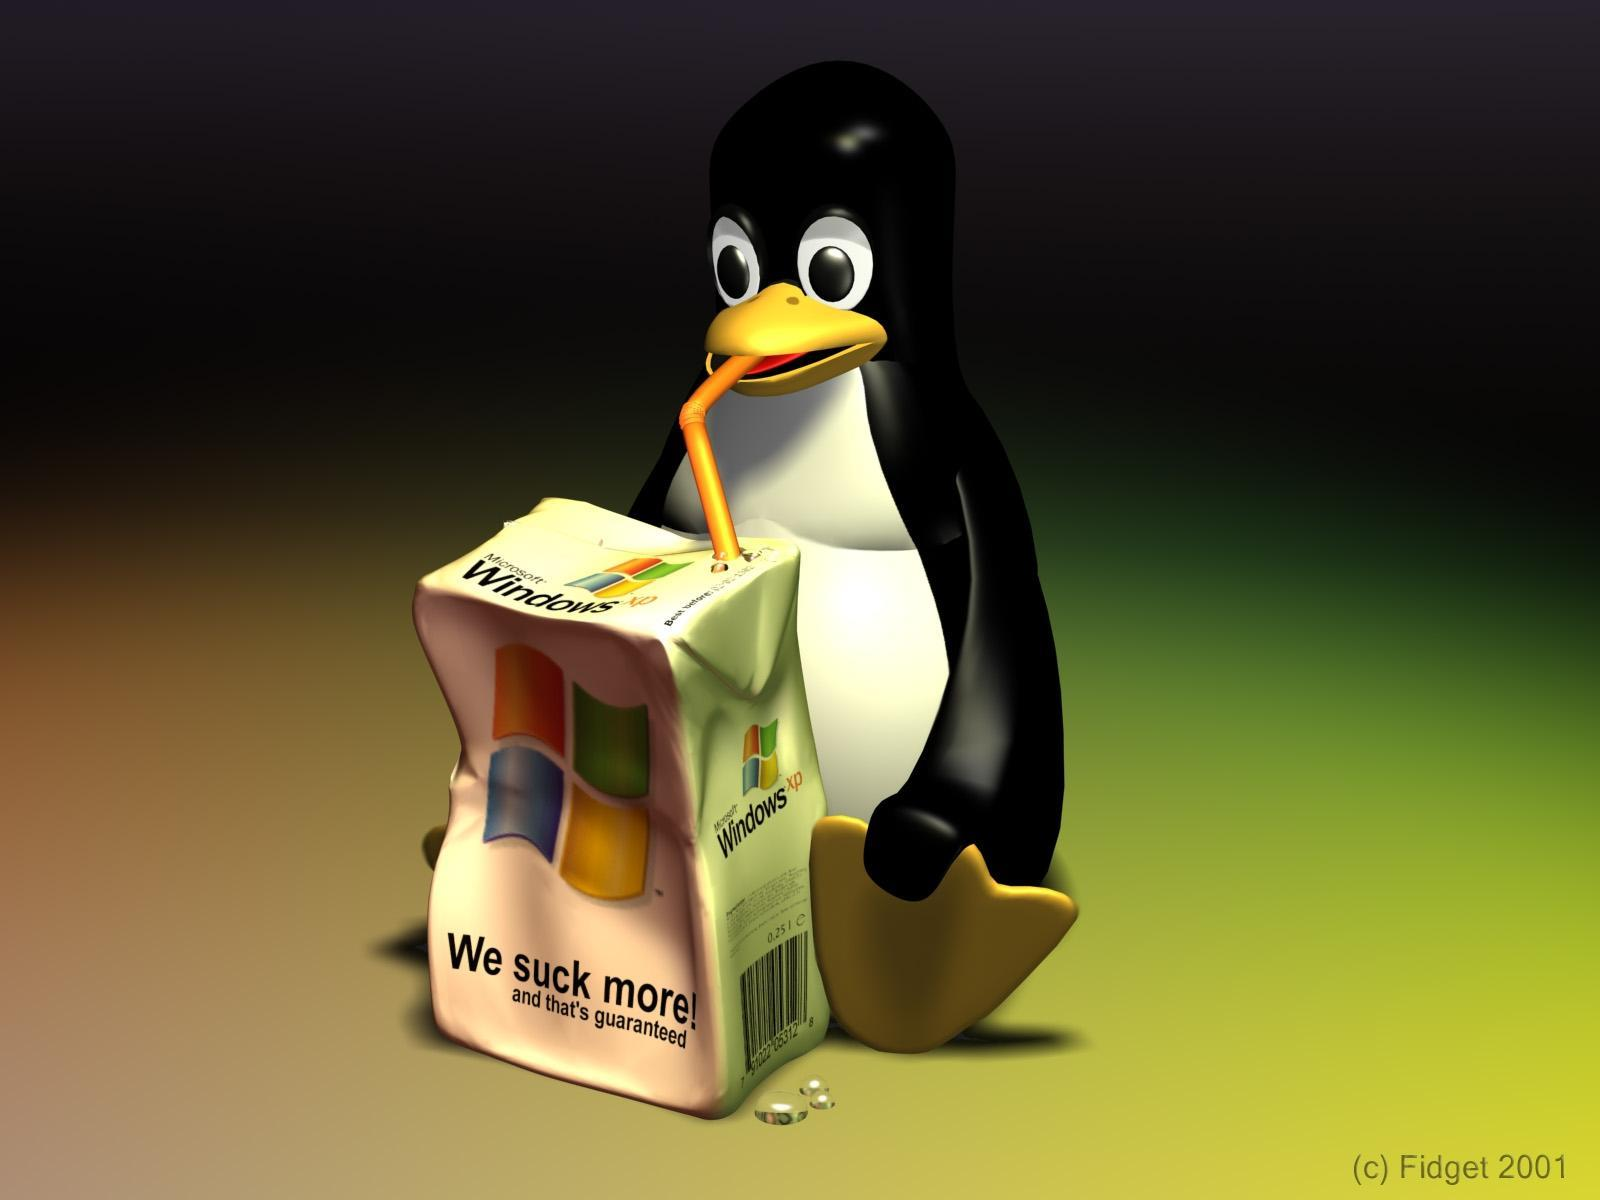 linux-ubuntu-wallpaper-OS-free-tux-le-manchot_2